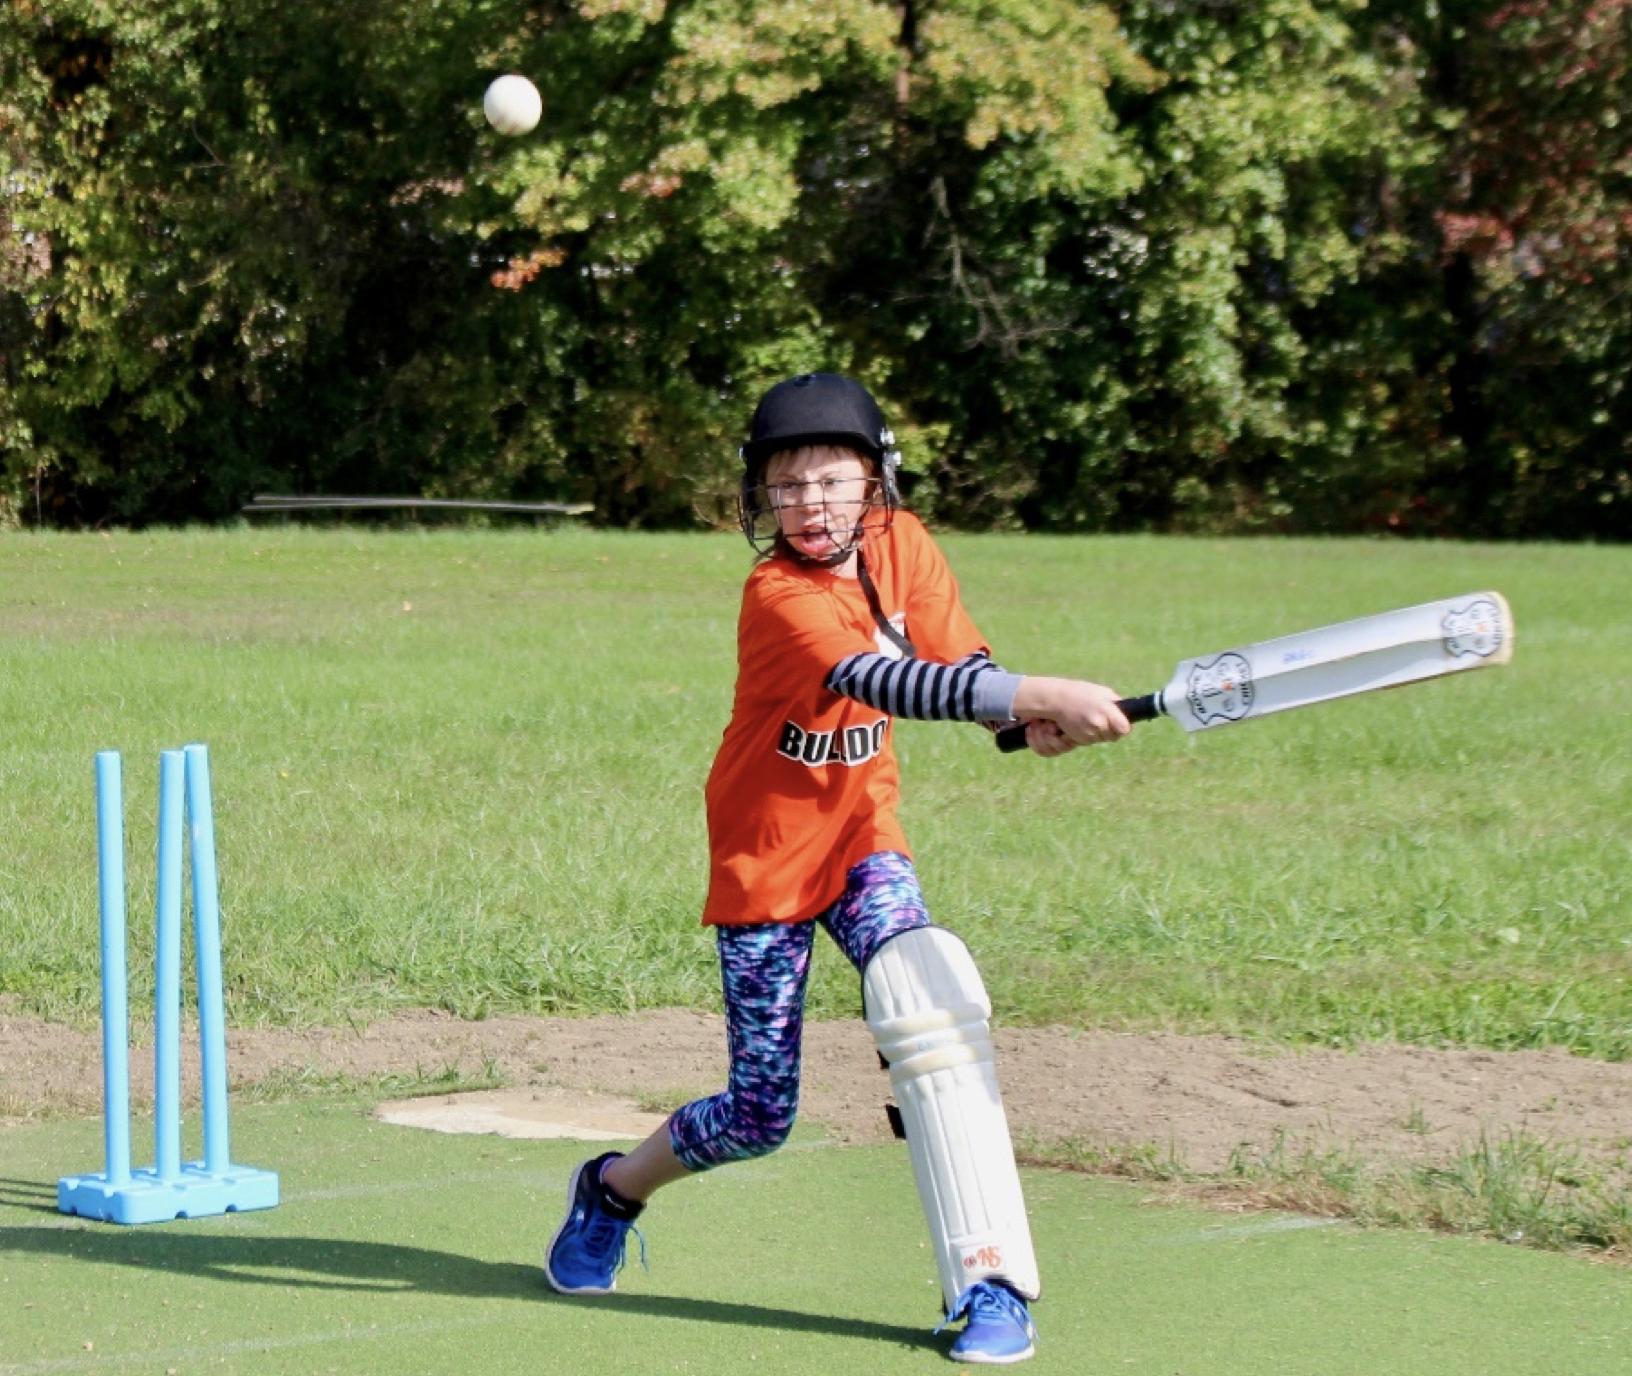 Cricket Tournament Anouncment Wording: Maryland Youth Cricket Association